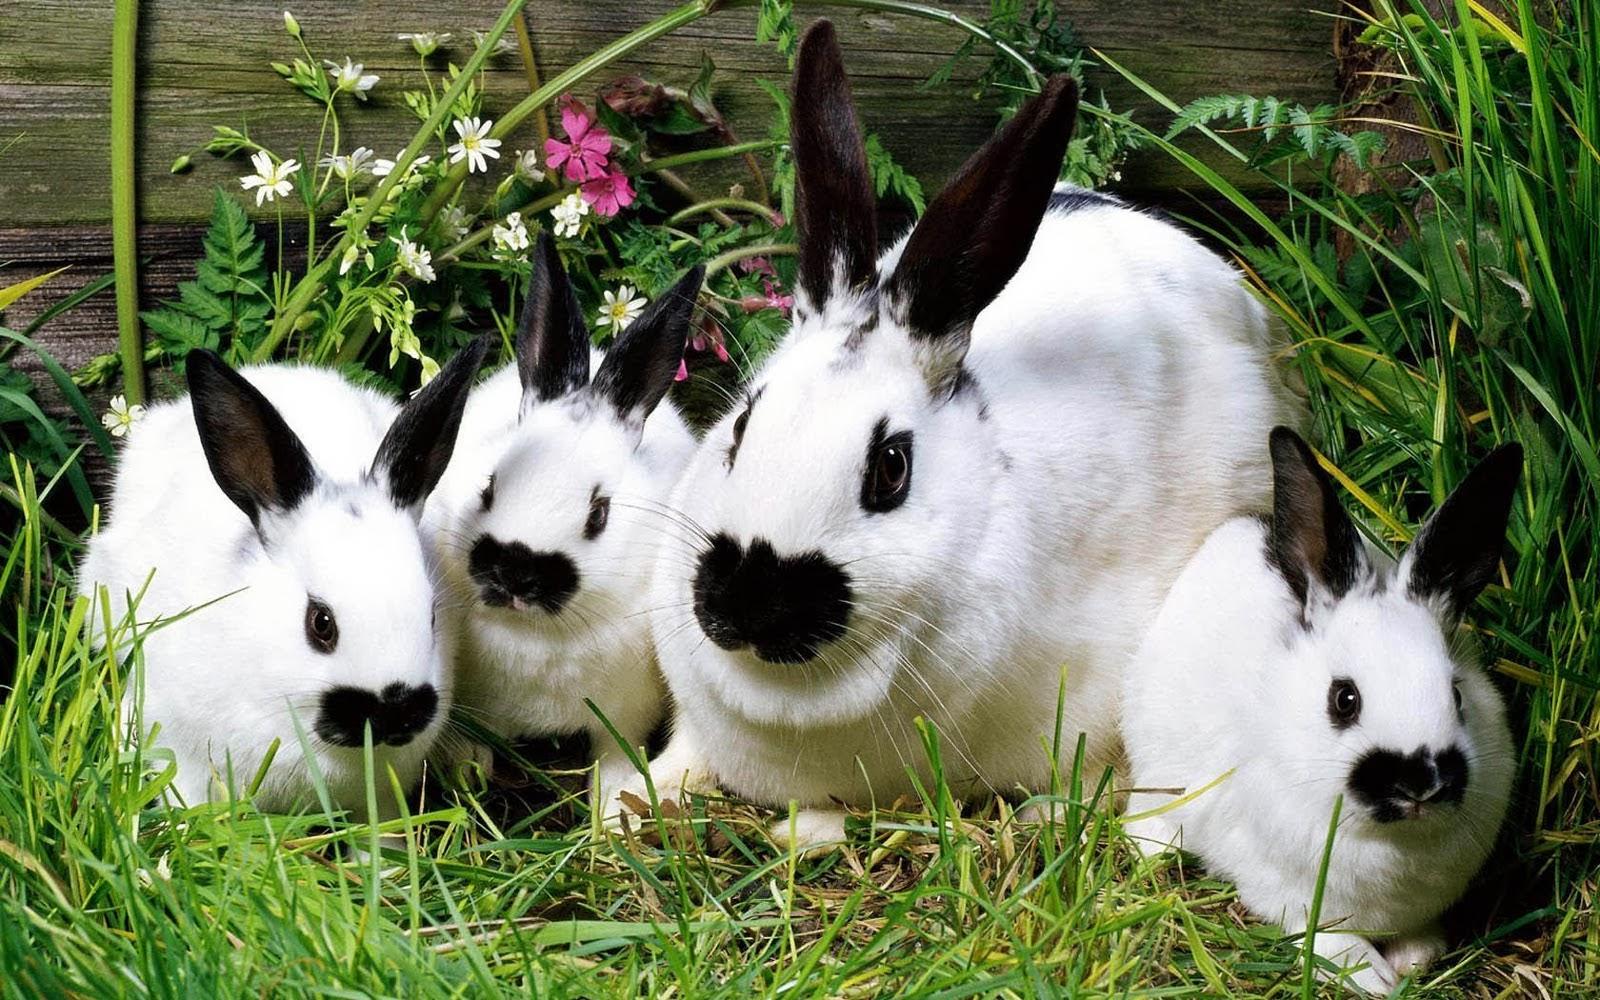 Cute White Rabbit Wallpapers For Desktop Desktop Hd Wallpapers Free Downloads Beautiful Baby